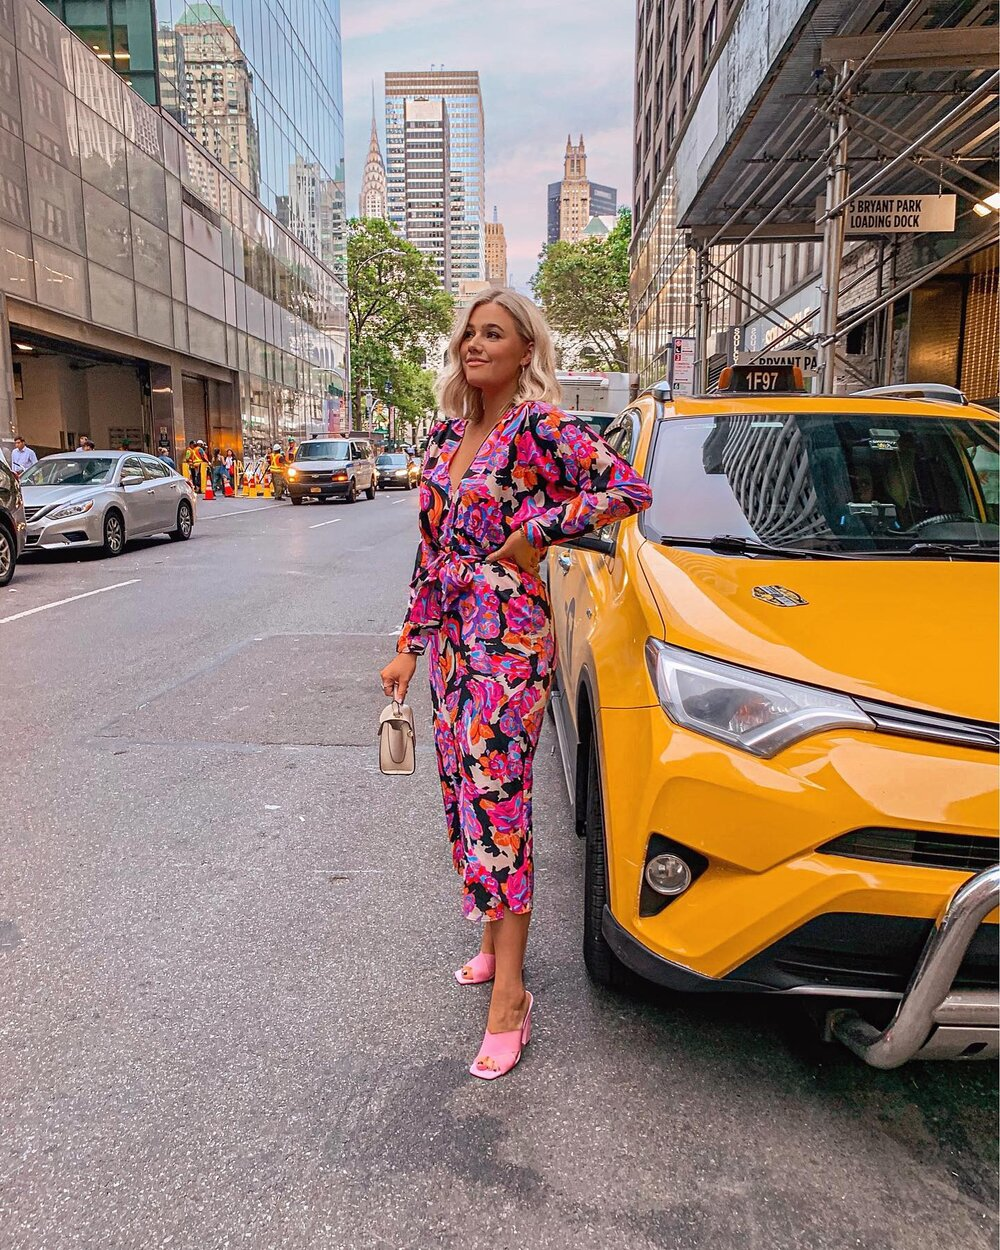 Bre Sheppard Retro Pink Dress NYC.JPG